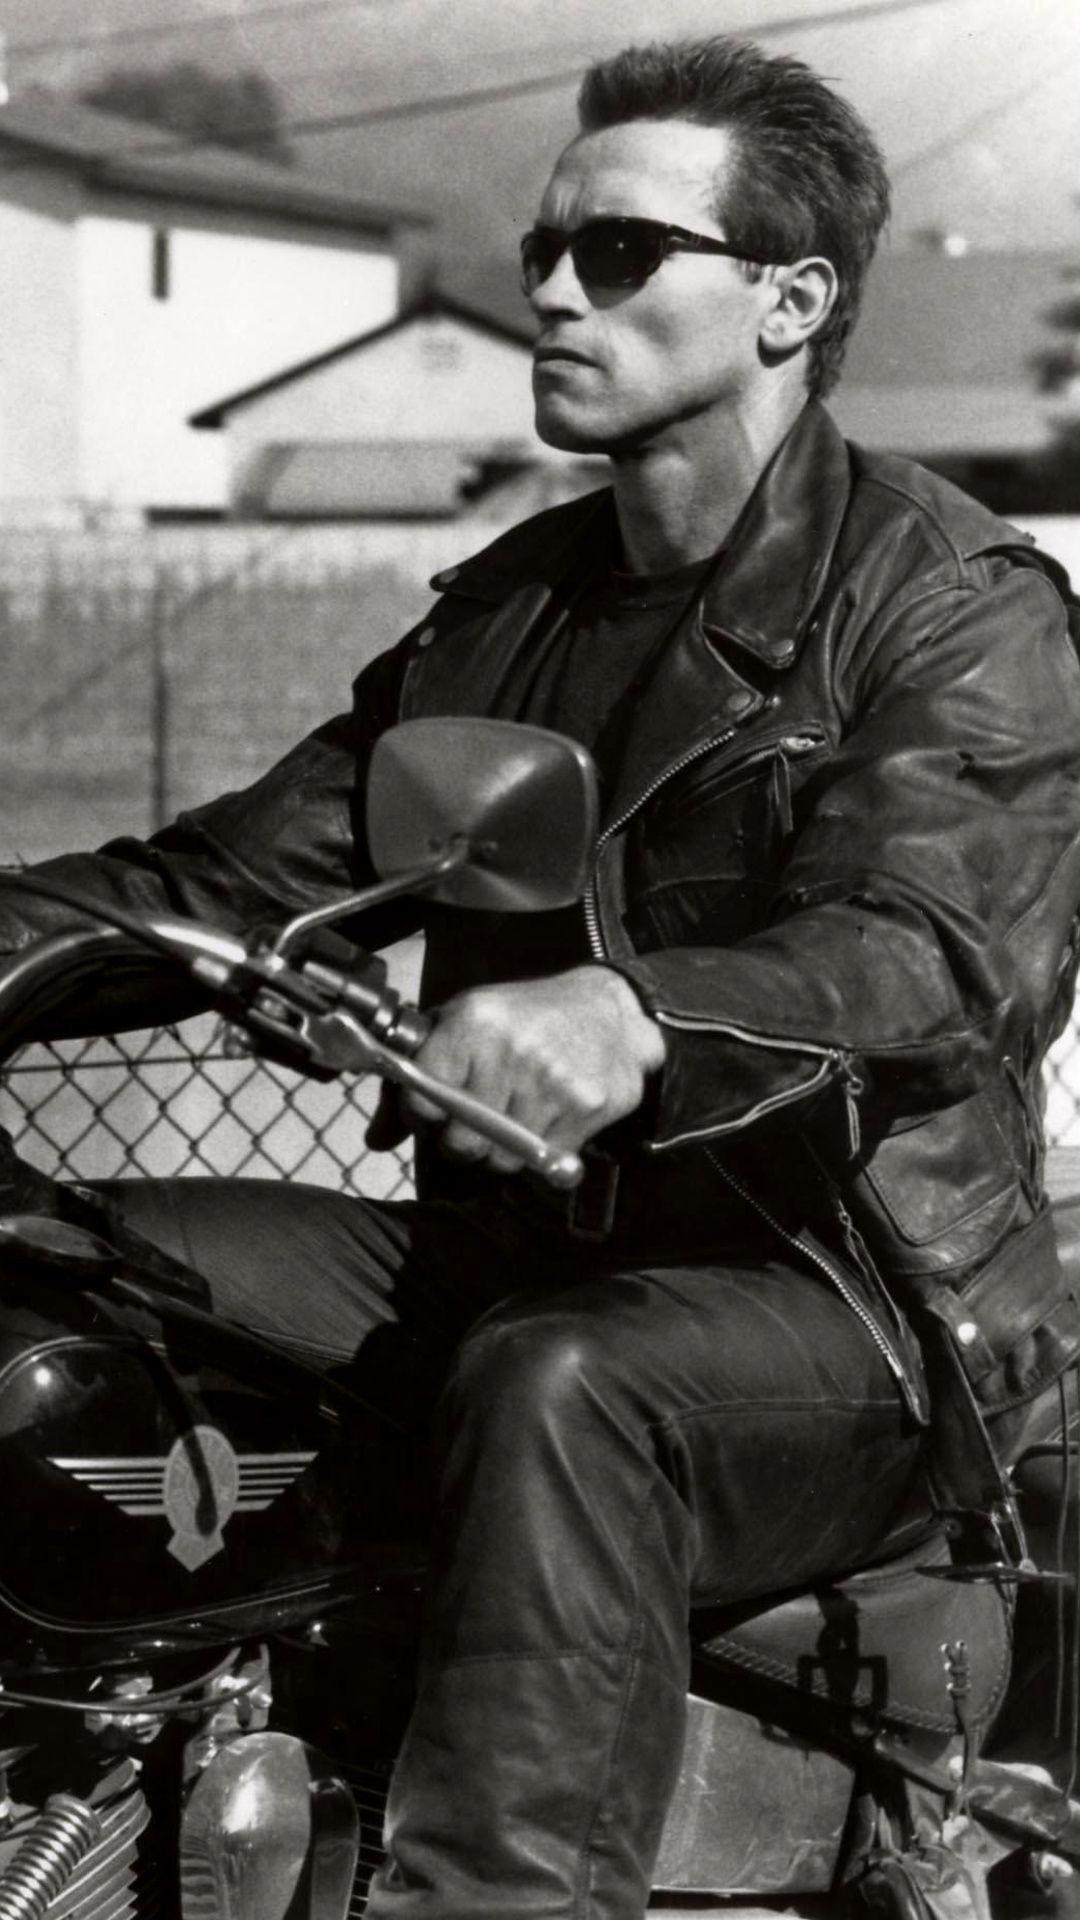 Terminator Arnold Schwarzenegger Wallpaper For Iphone Plus